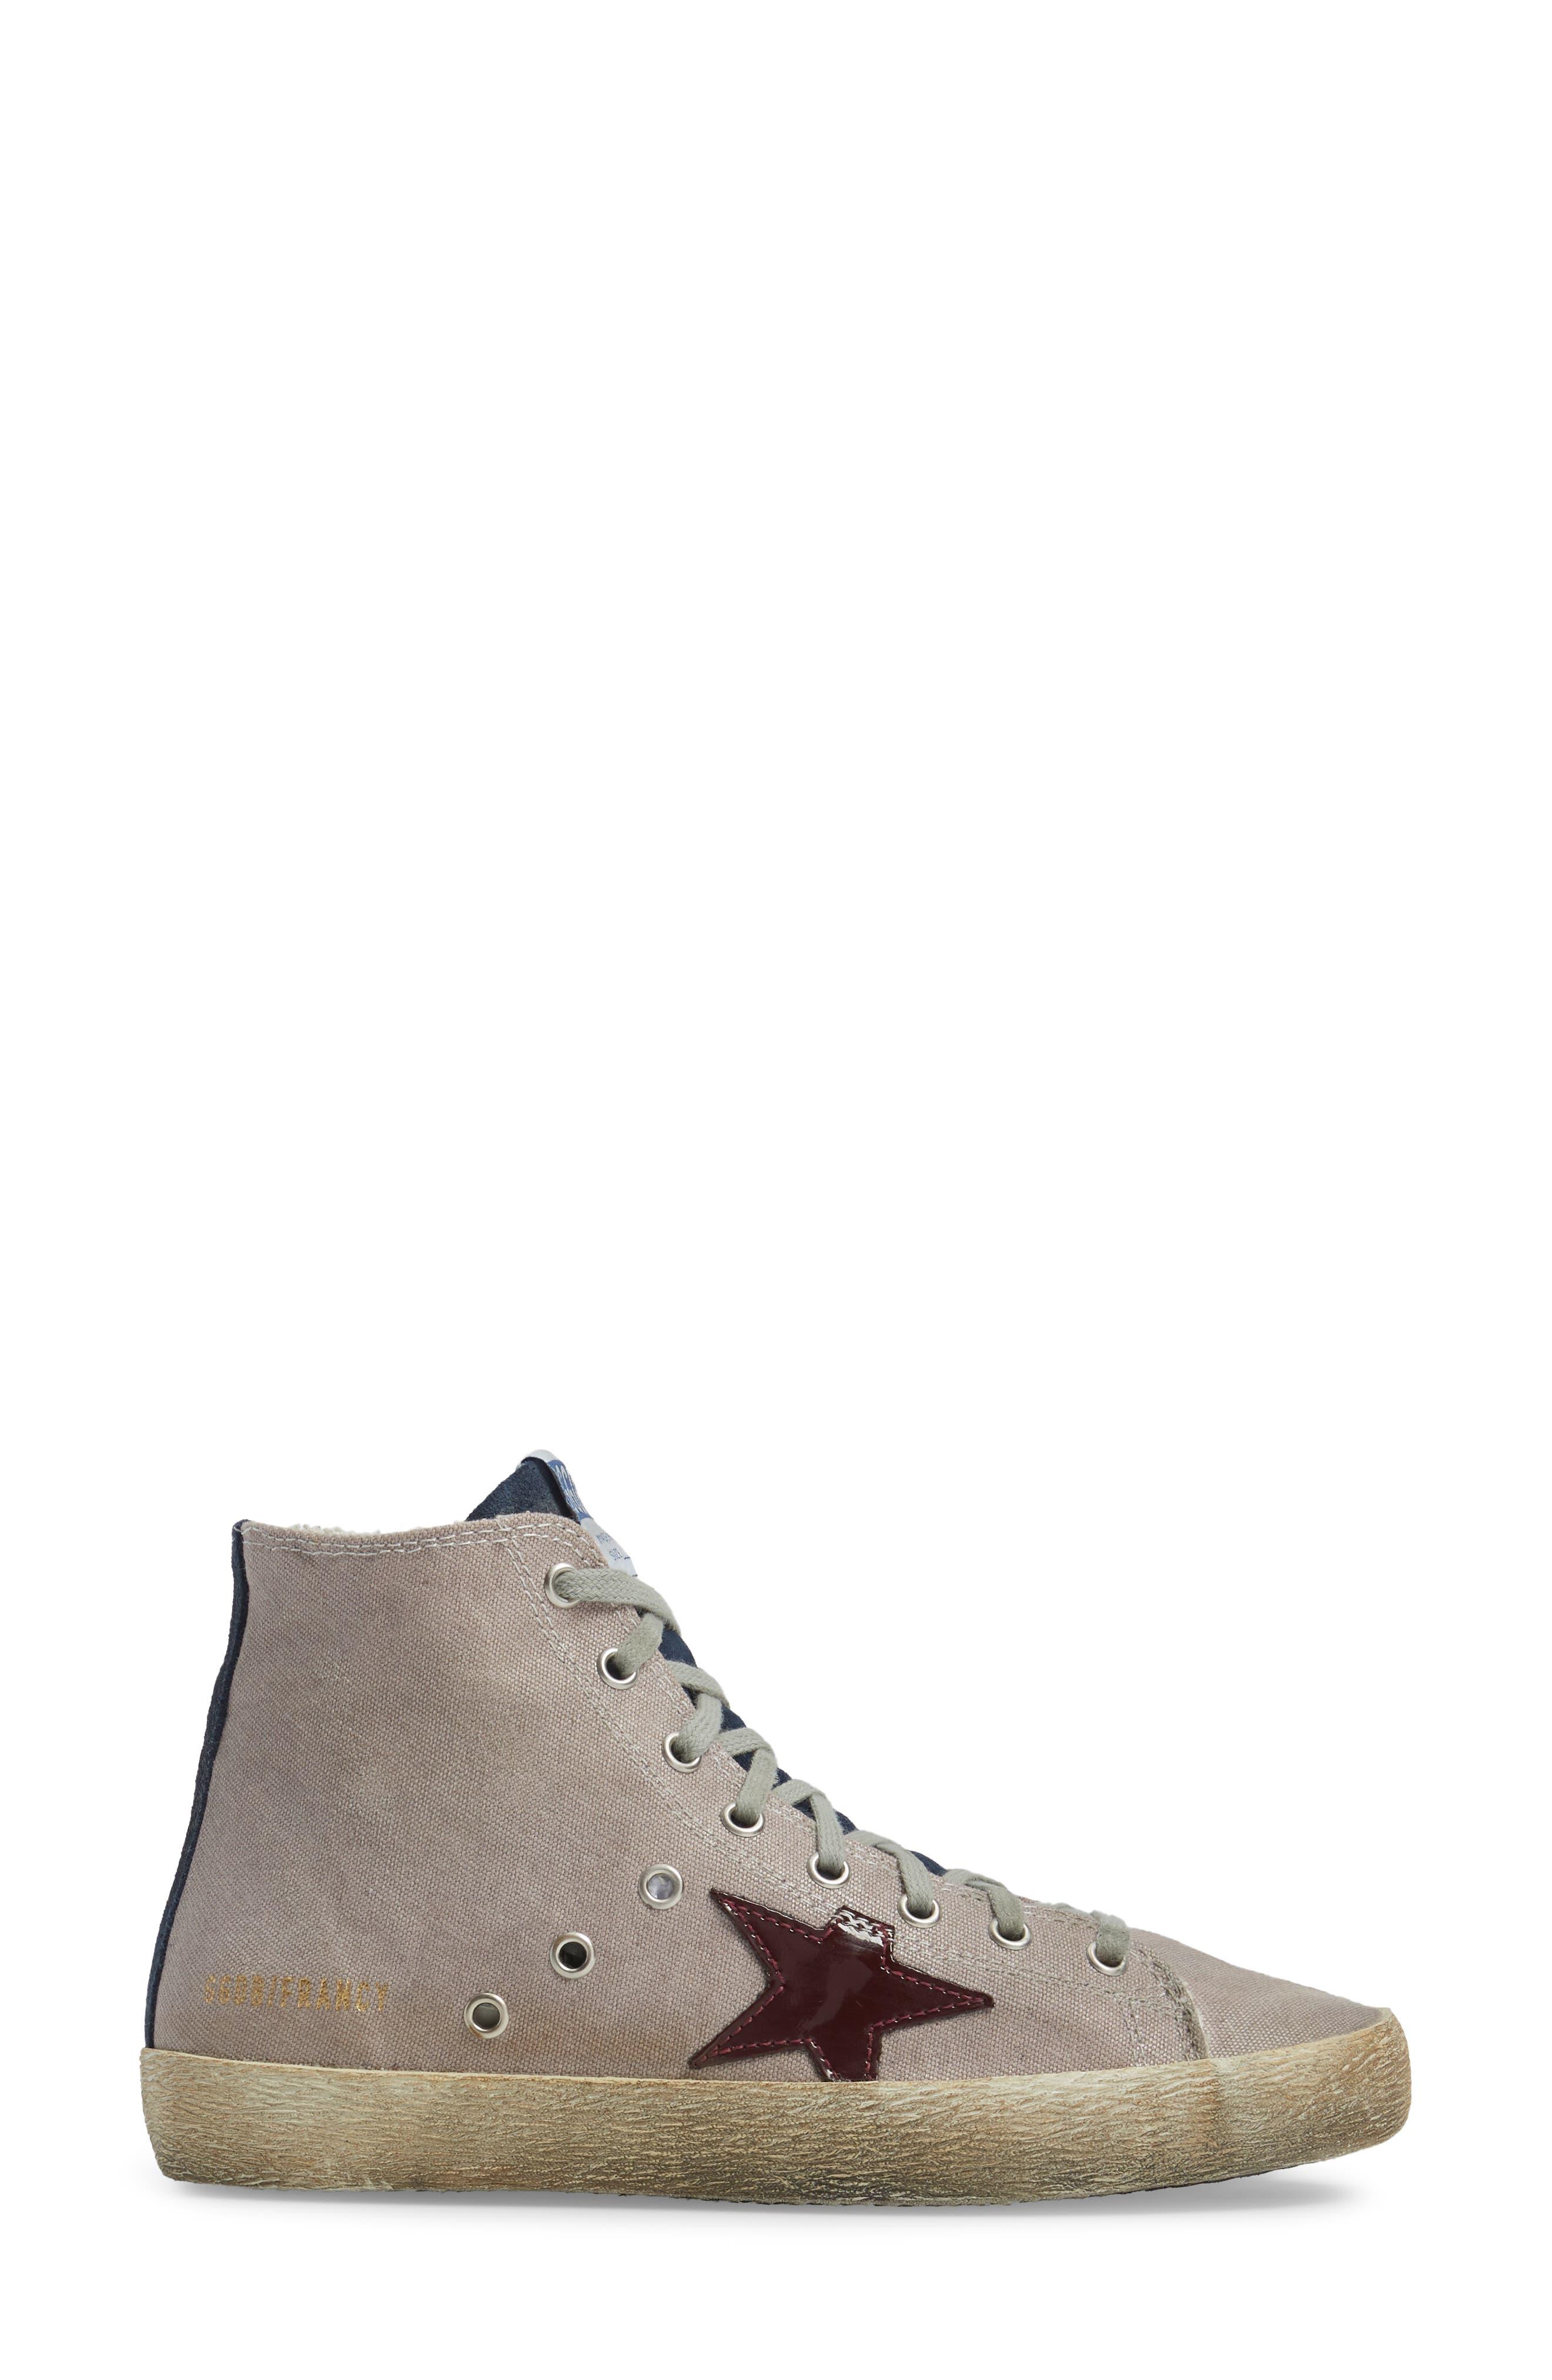 Francy Mid Top Sneaker,                             Alternate thumbnail 3, color,                             530